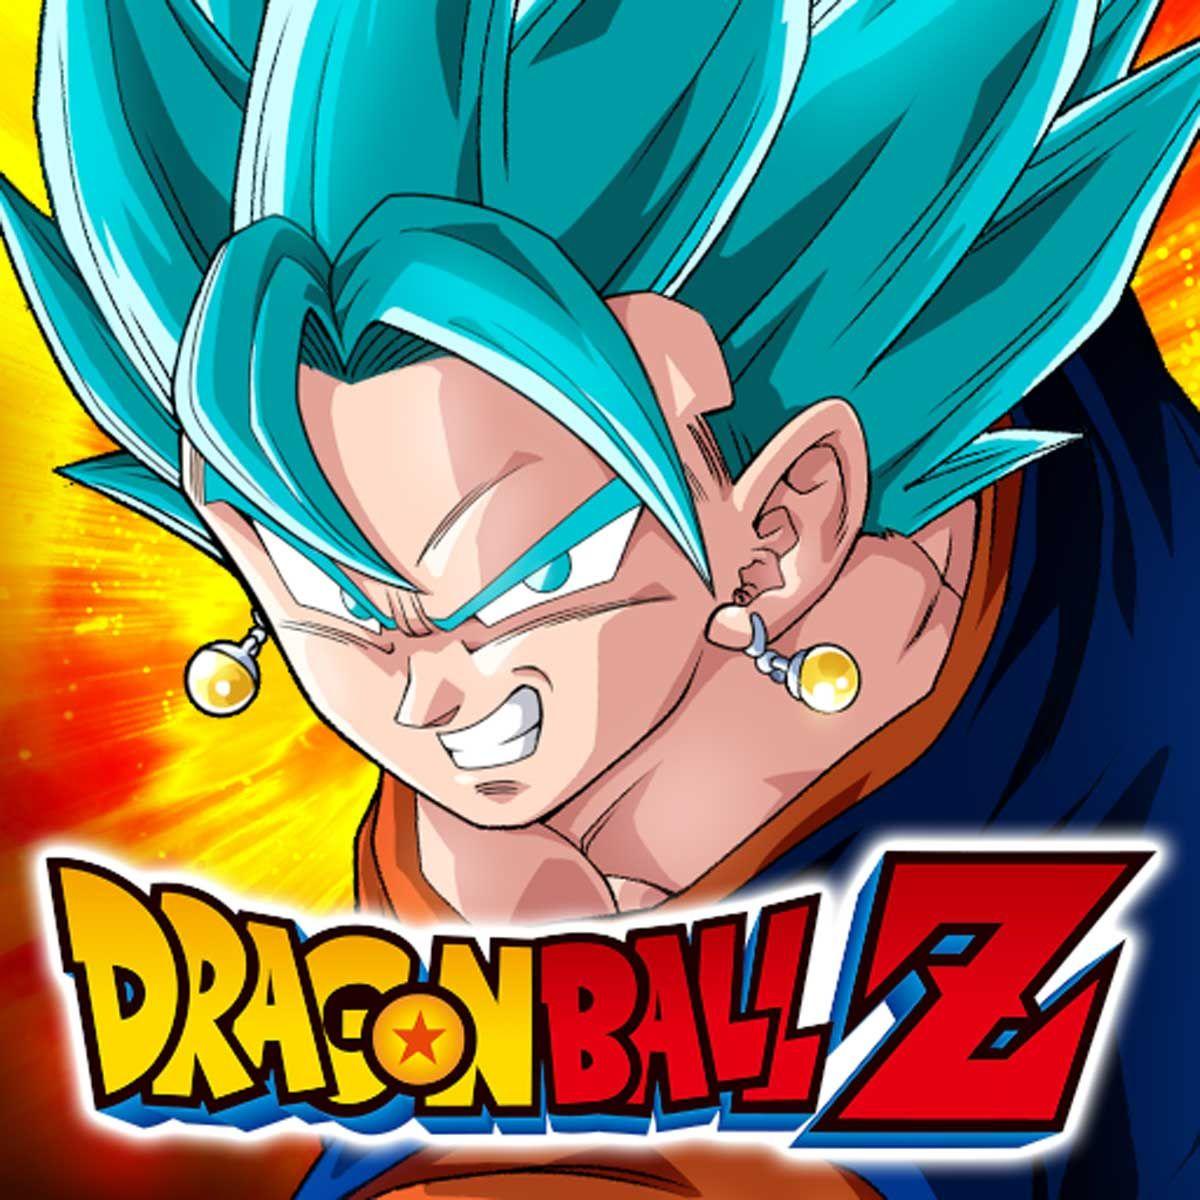 Dragon Ball Z Dokkan Battle Mod 4 8 4 Apk Global Dengan Gambar